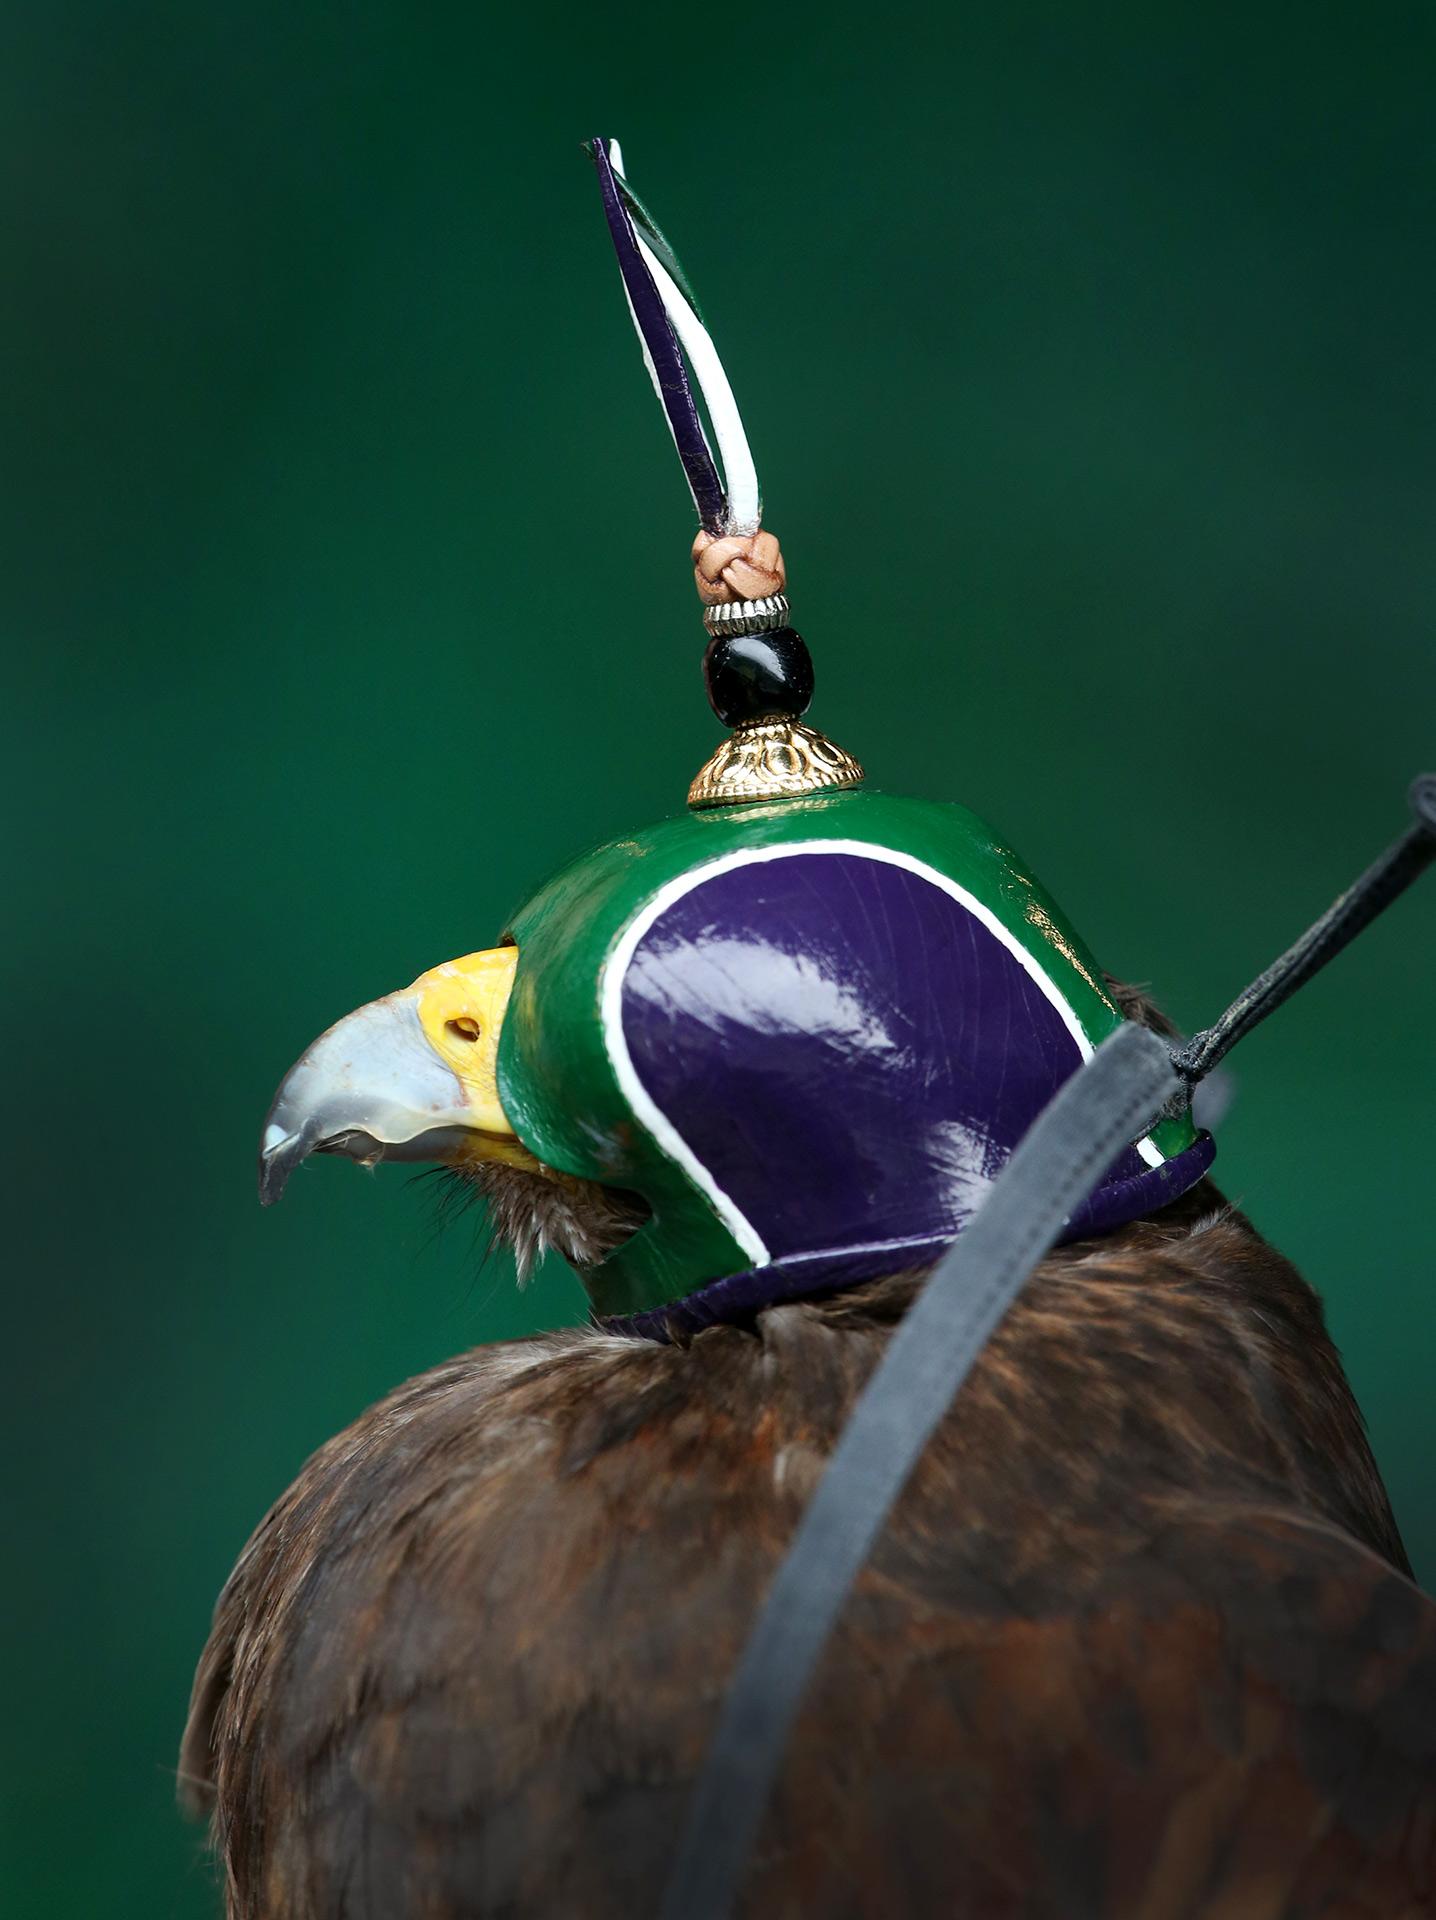 Rufus the Harris hawk